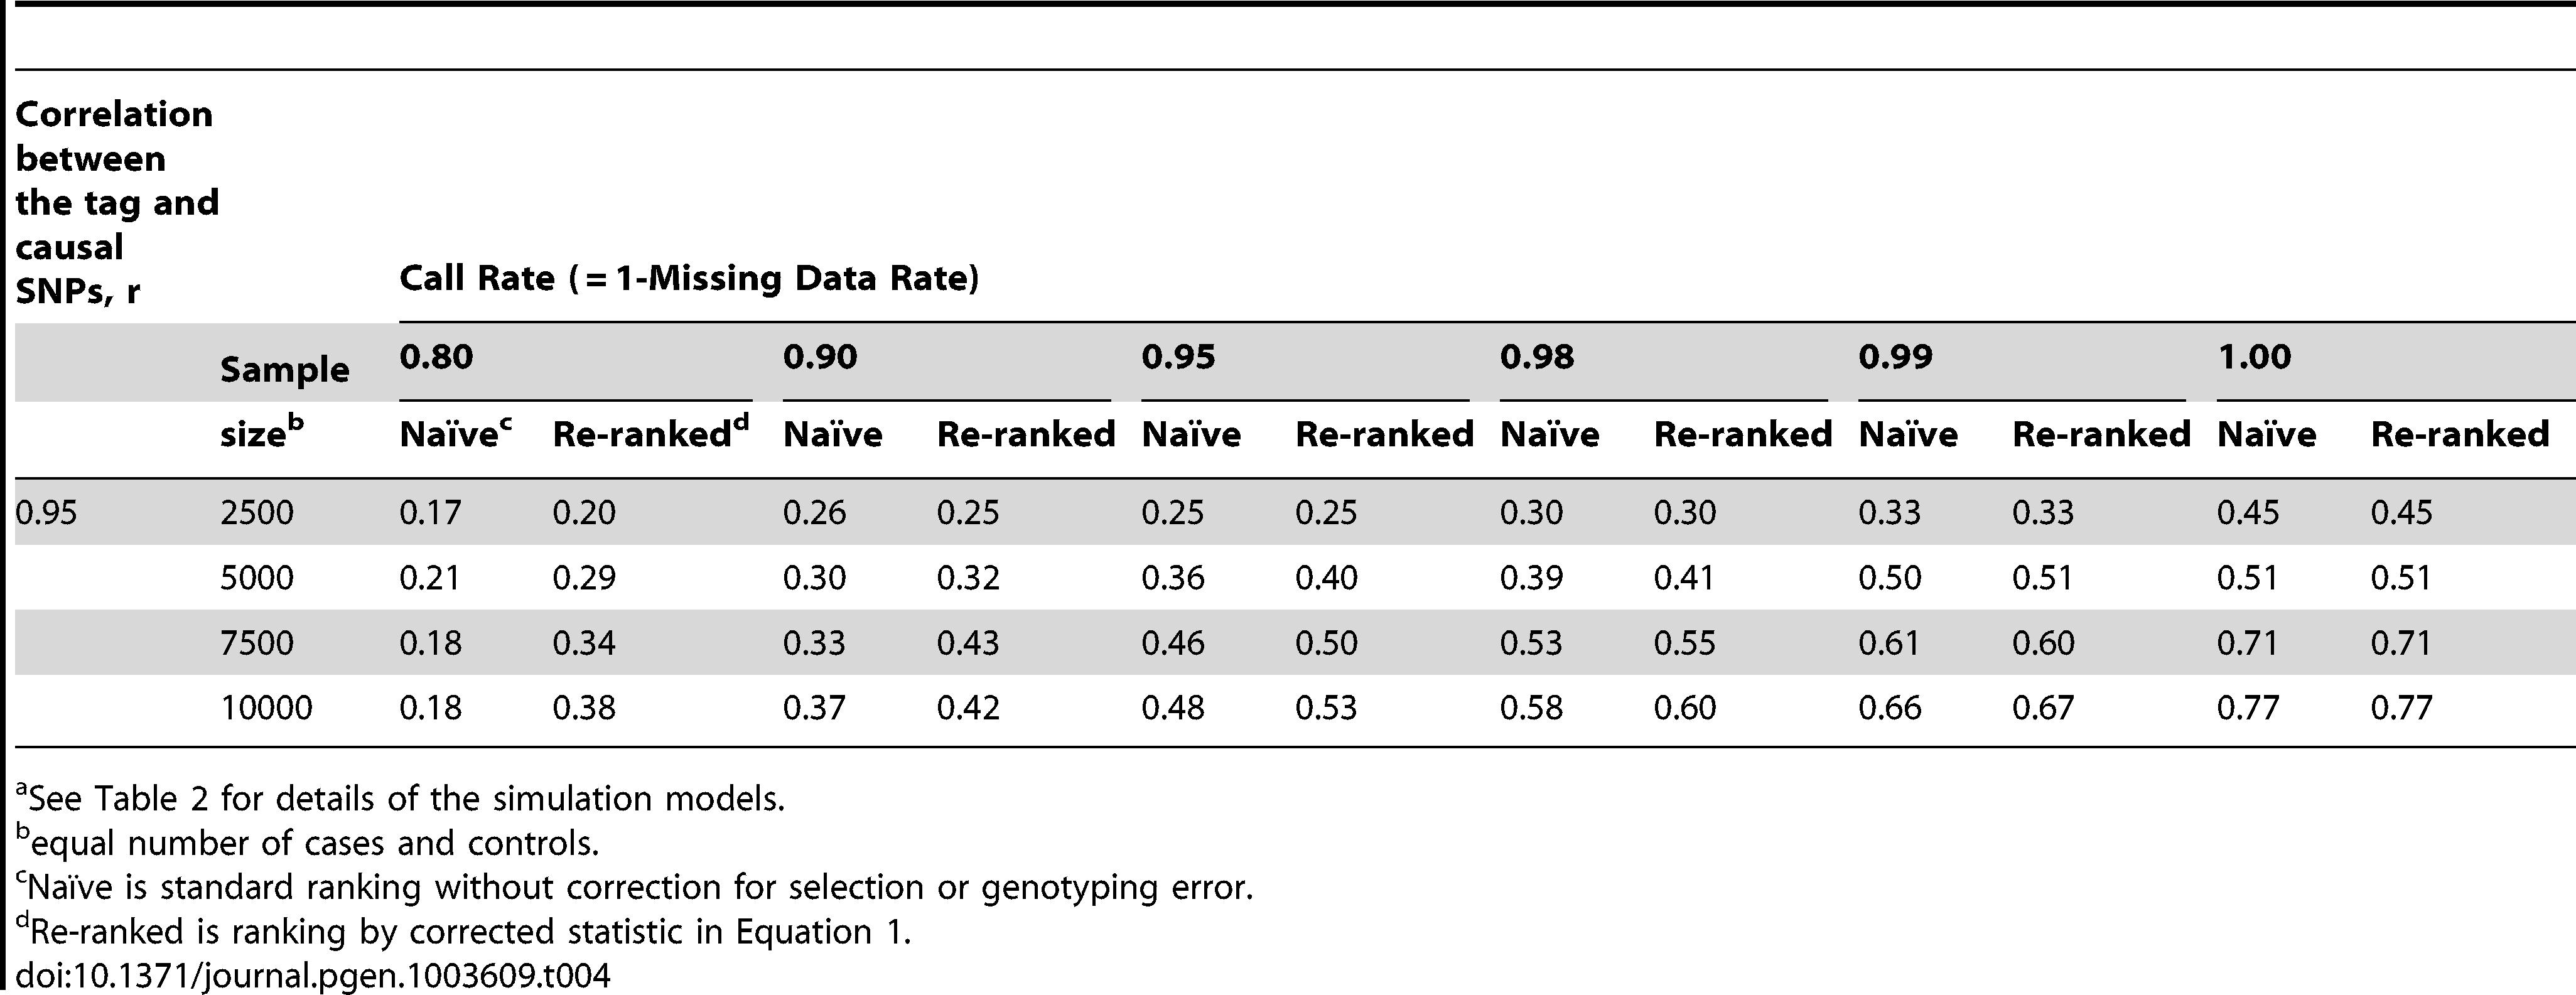 Localization success rates for simulation Scenarios 5<em class=&quot;ref&quot;>a</em>.